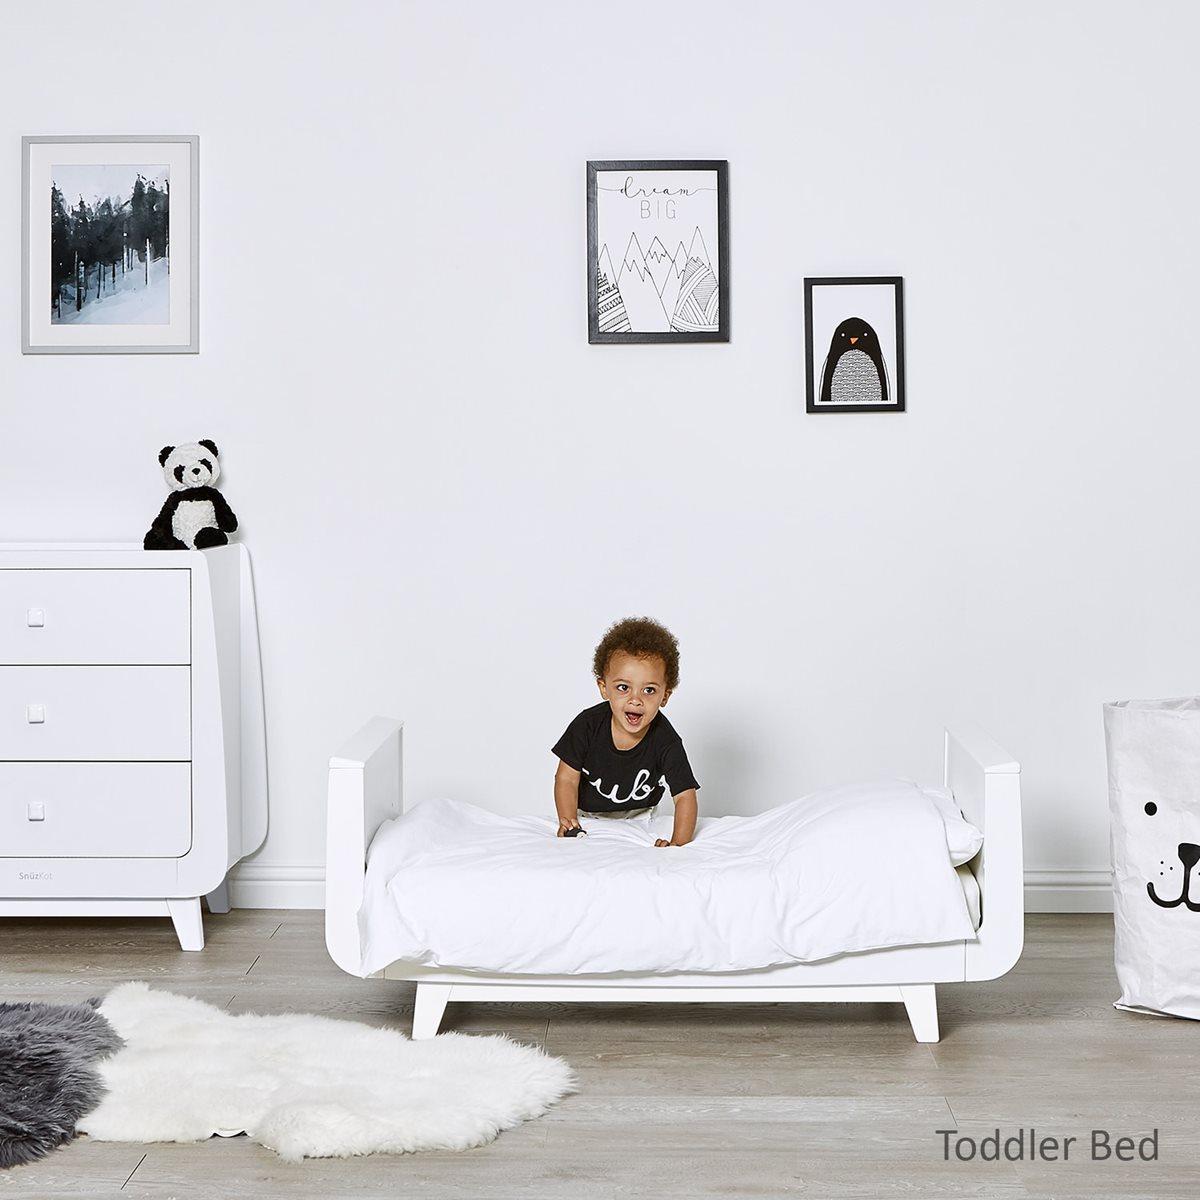 White Nursery Furniture Sets Part - 50: Snüz   SnuzKot Luxe 2 Piece Nursery Furniture Set White   Snüz